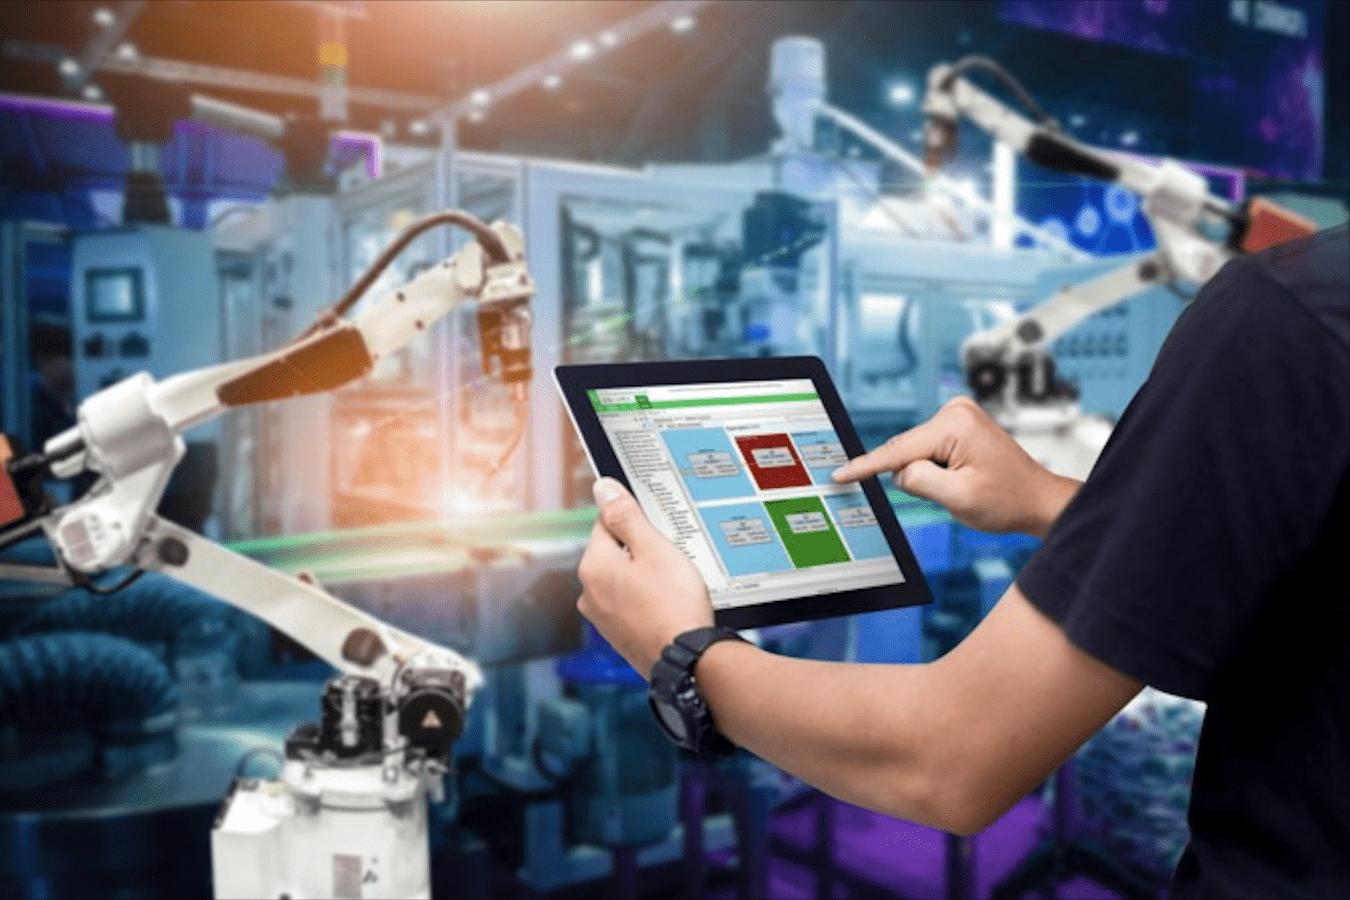 un informe demuestra que la automatizacio n universal podri a ahorrar a la industria hasta 30 mil millones de do lares